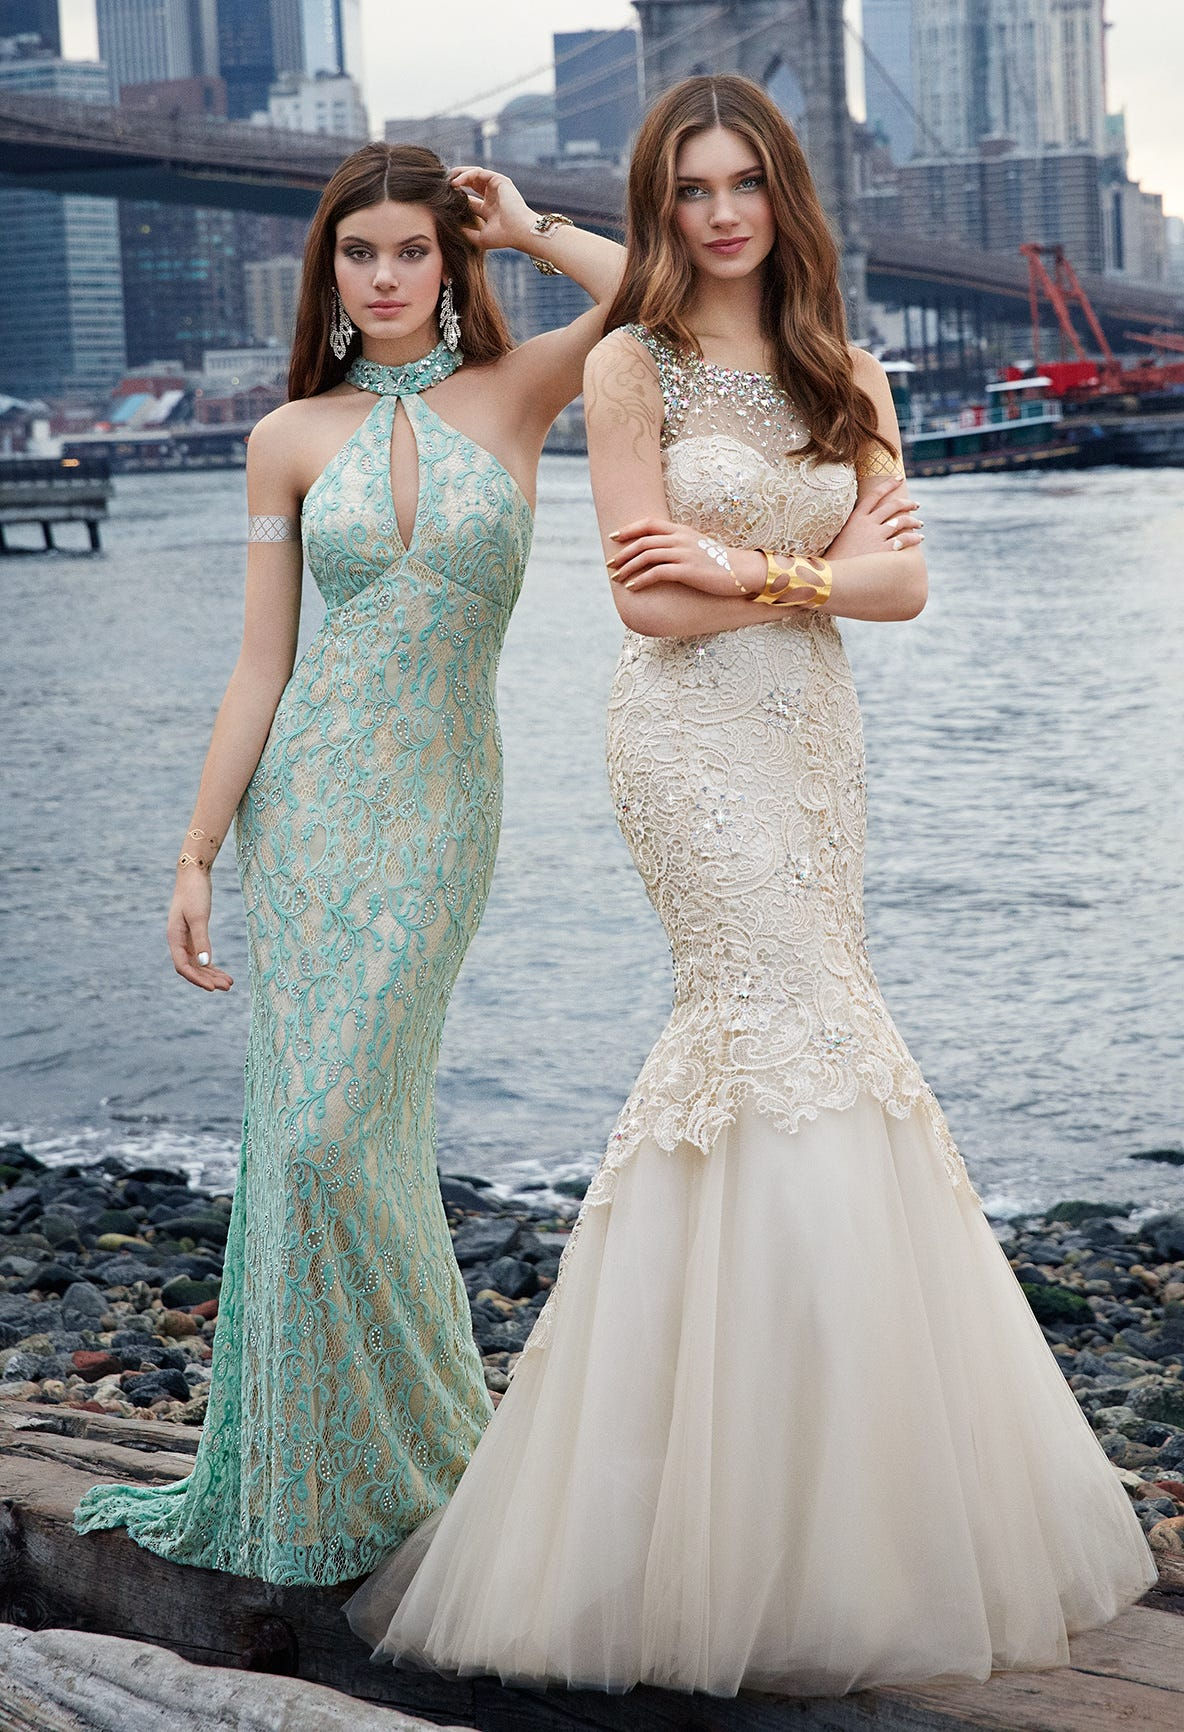 High School Slutty Prom Dresses